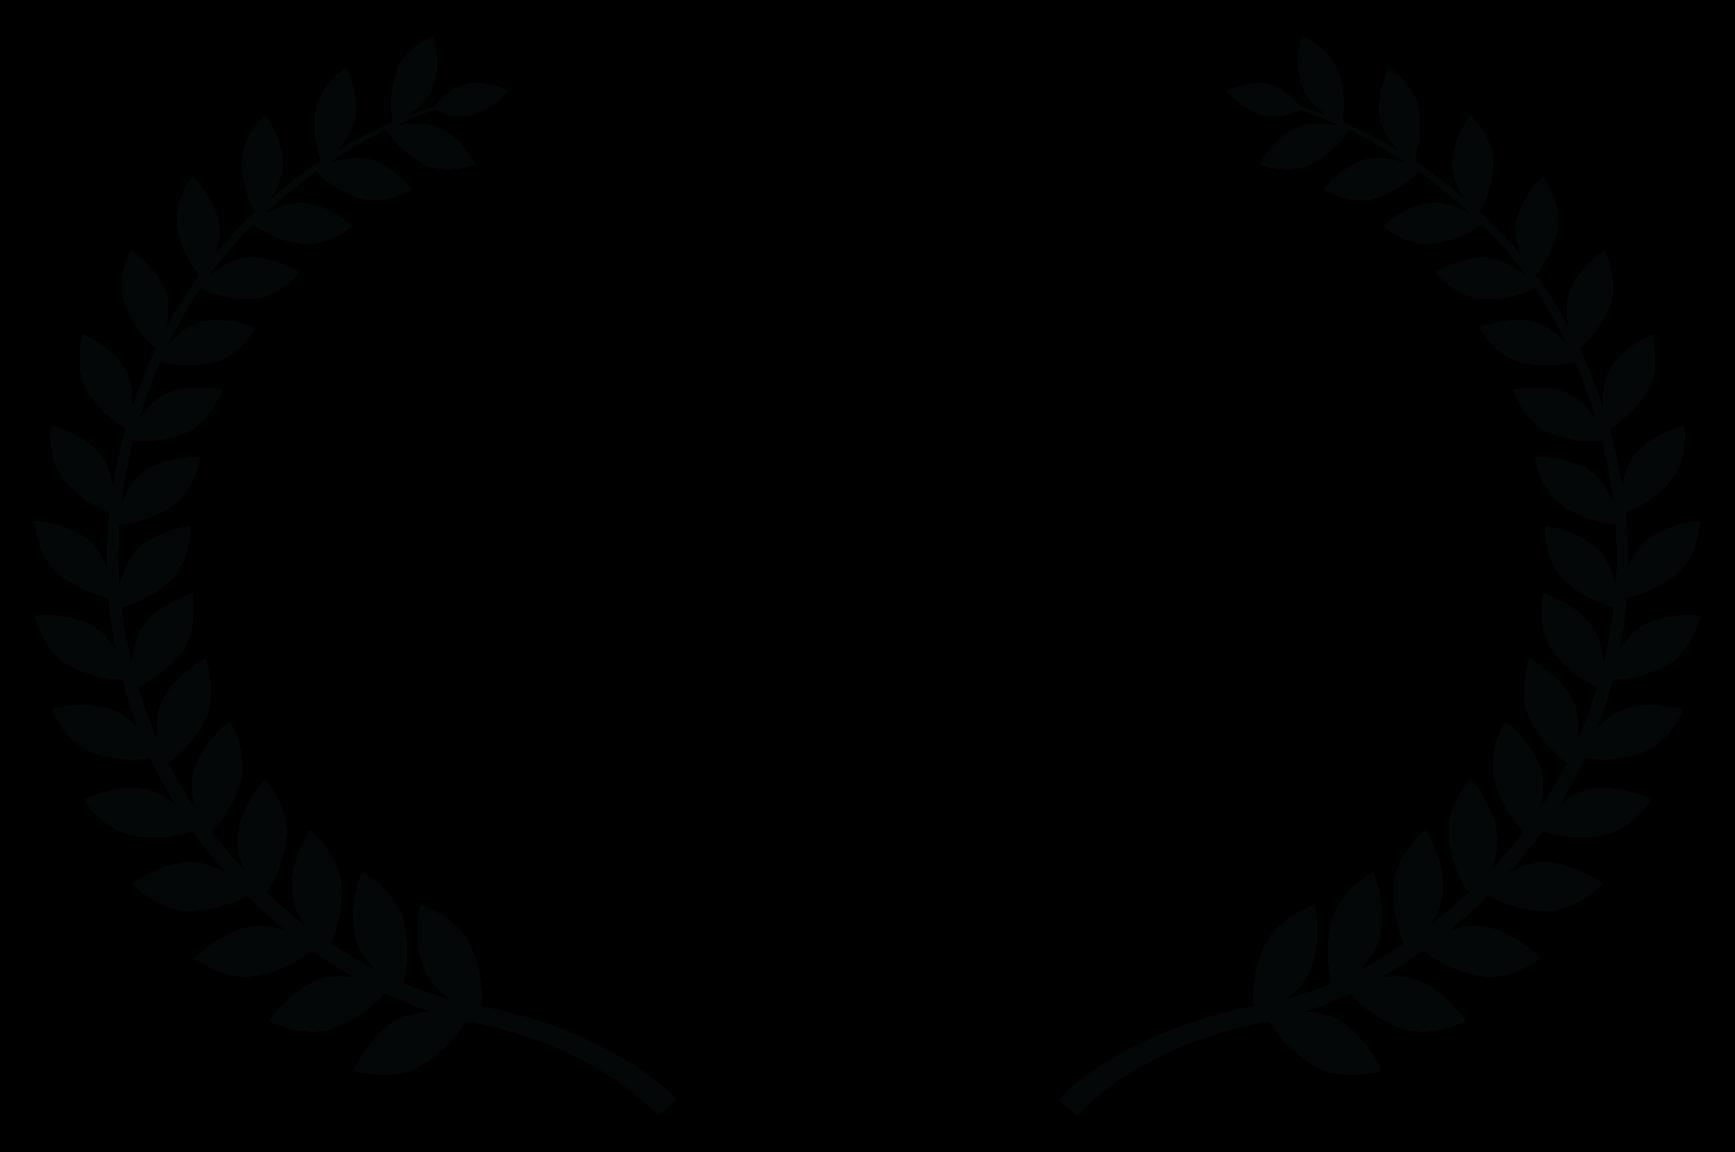 OFFICIAL SELECTION - Ozark Shorts - 2016-2.png